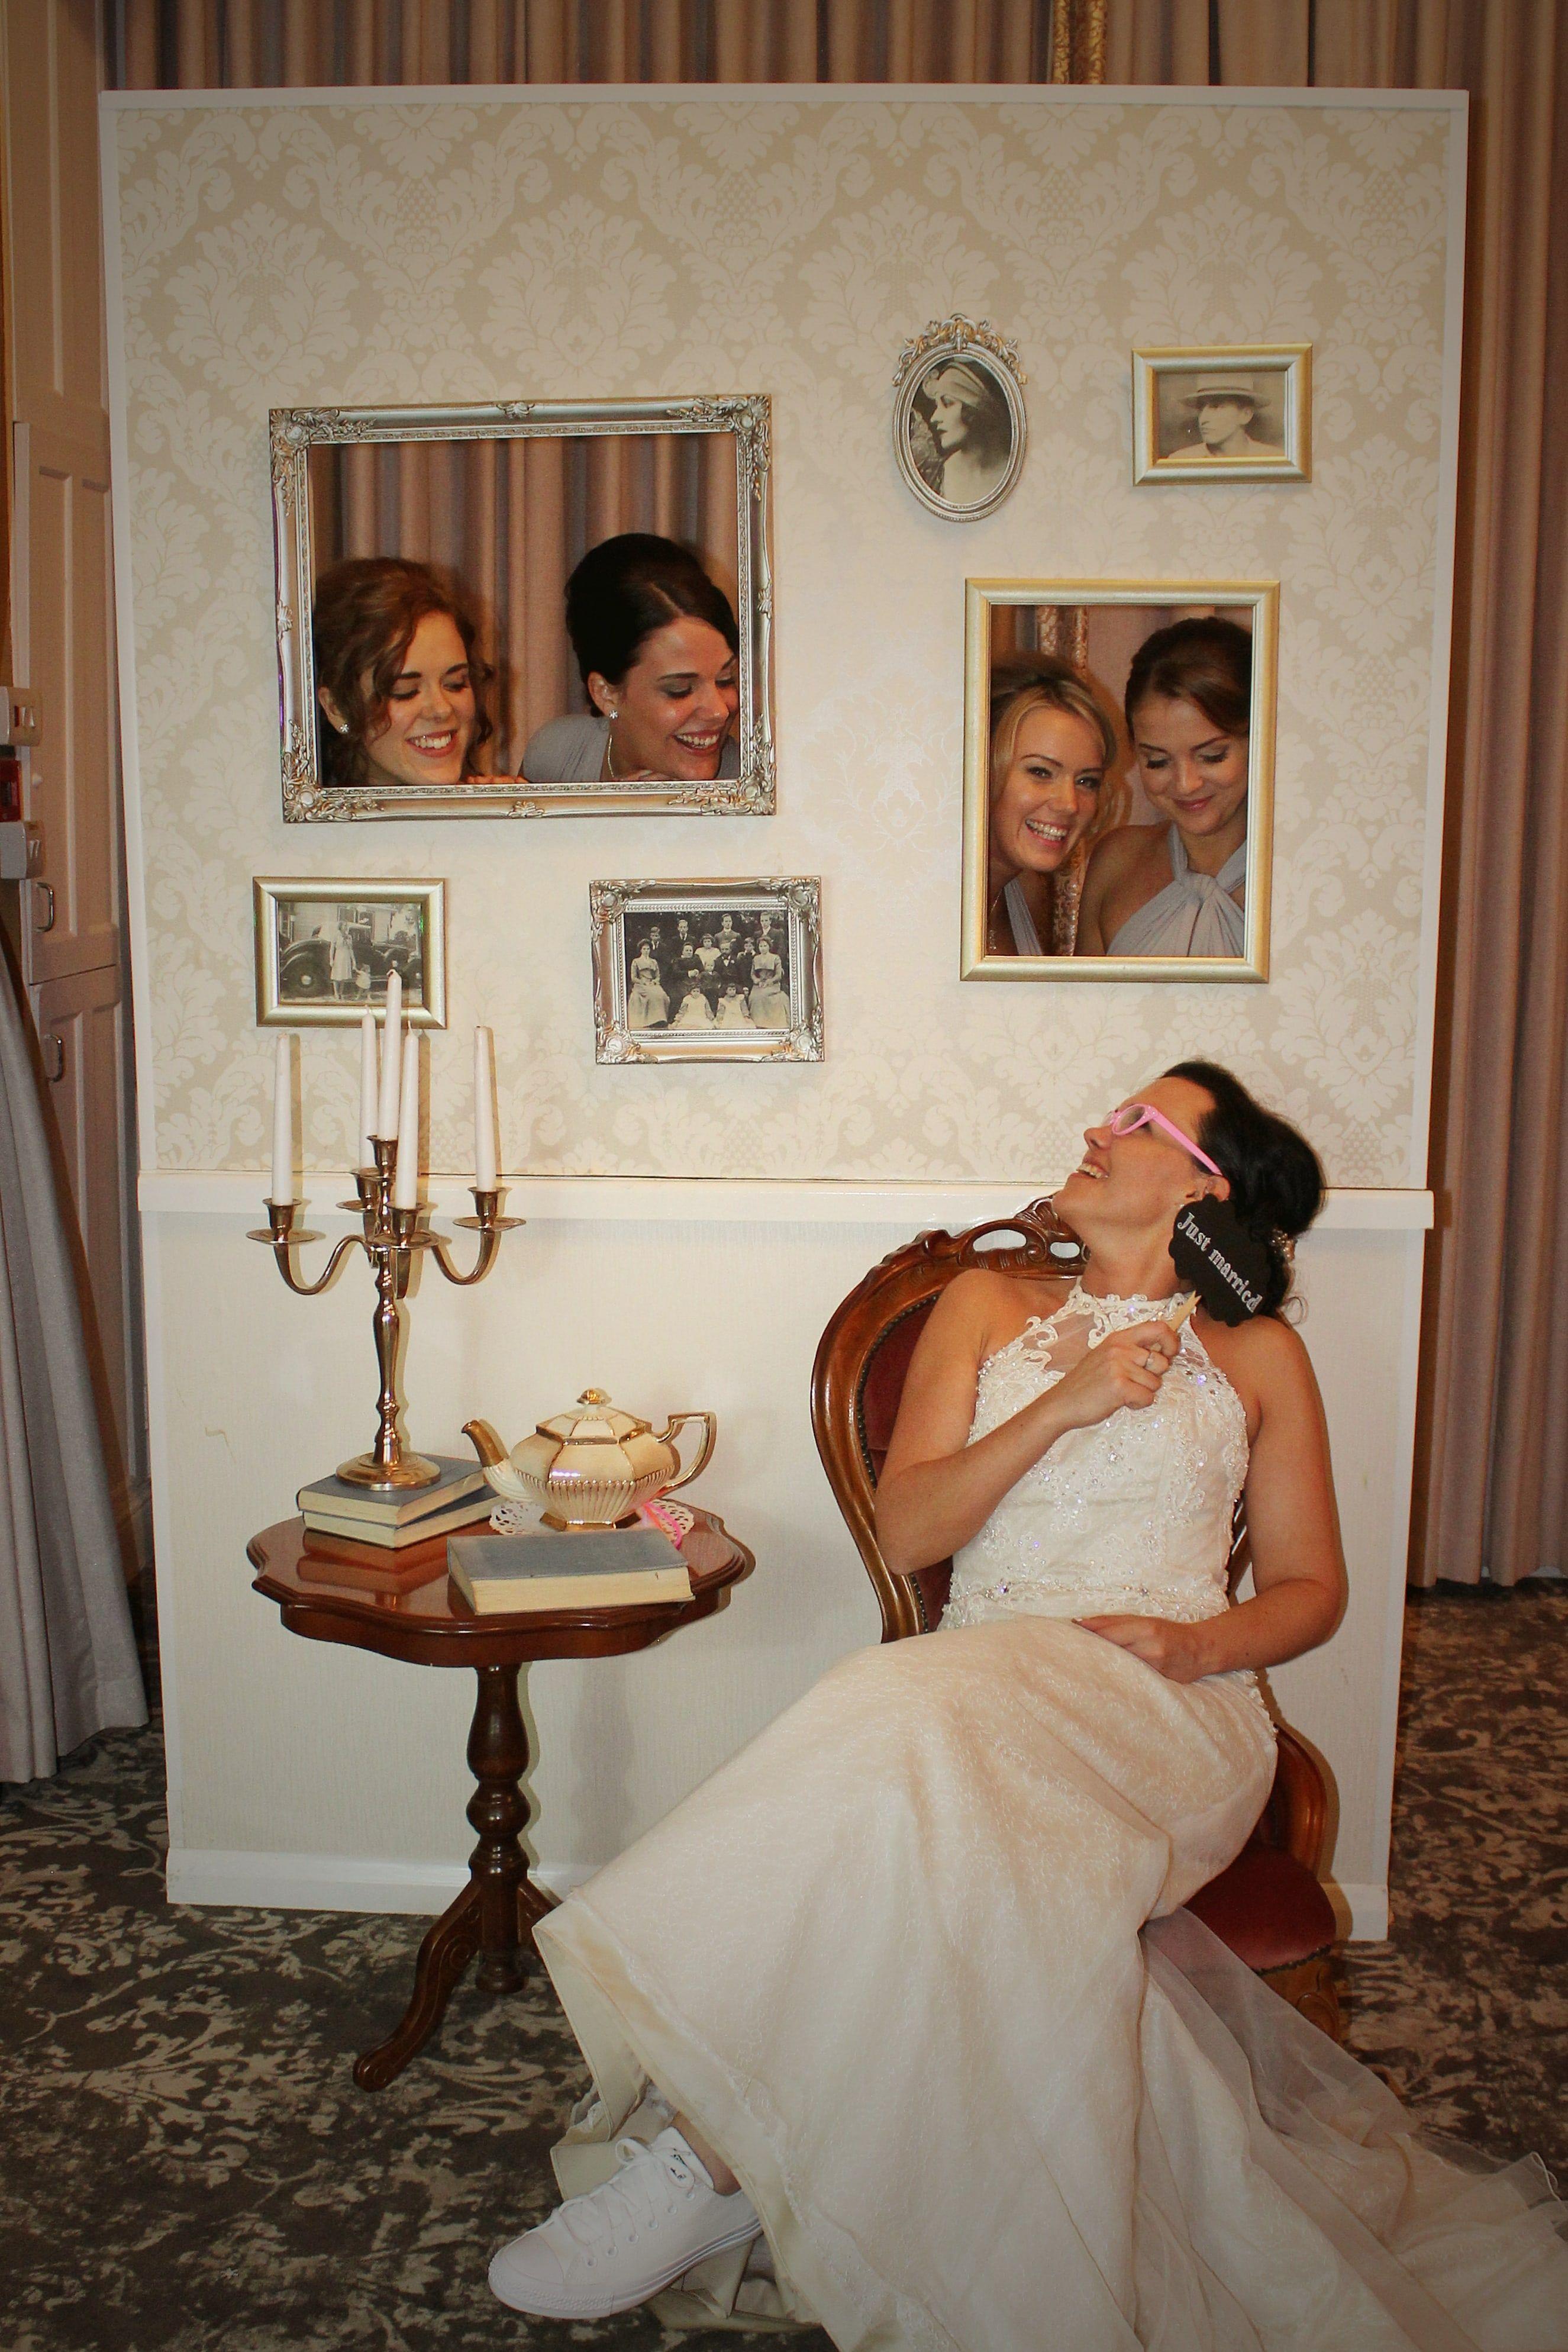 vintage photo booth wall the rustic wedding company wedding ideas